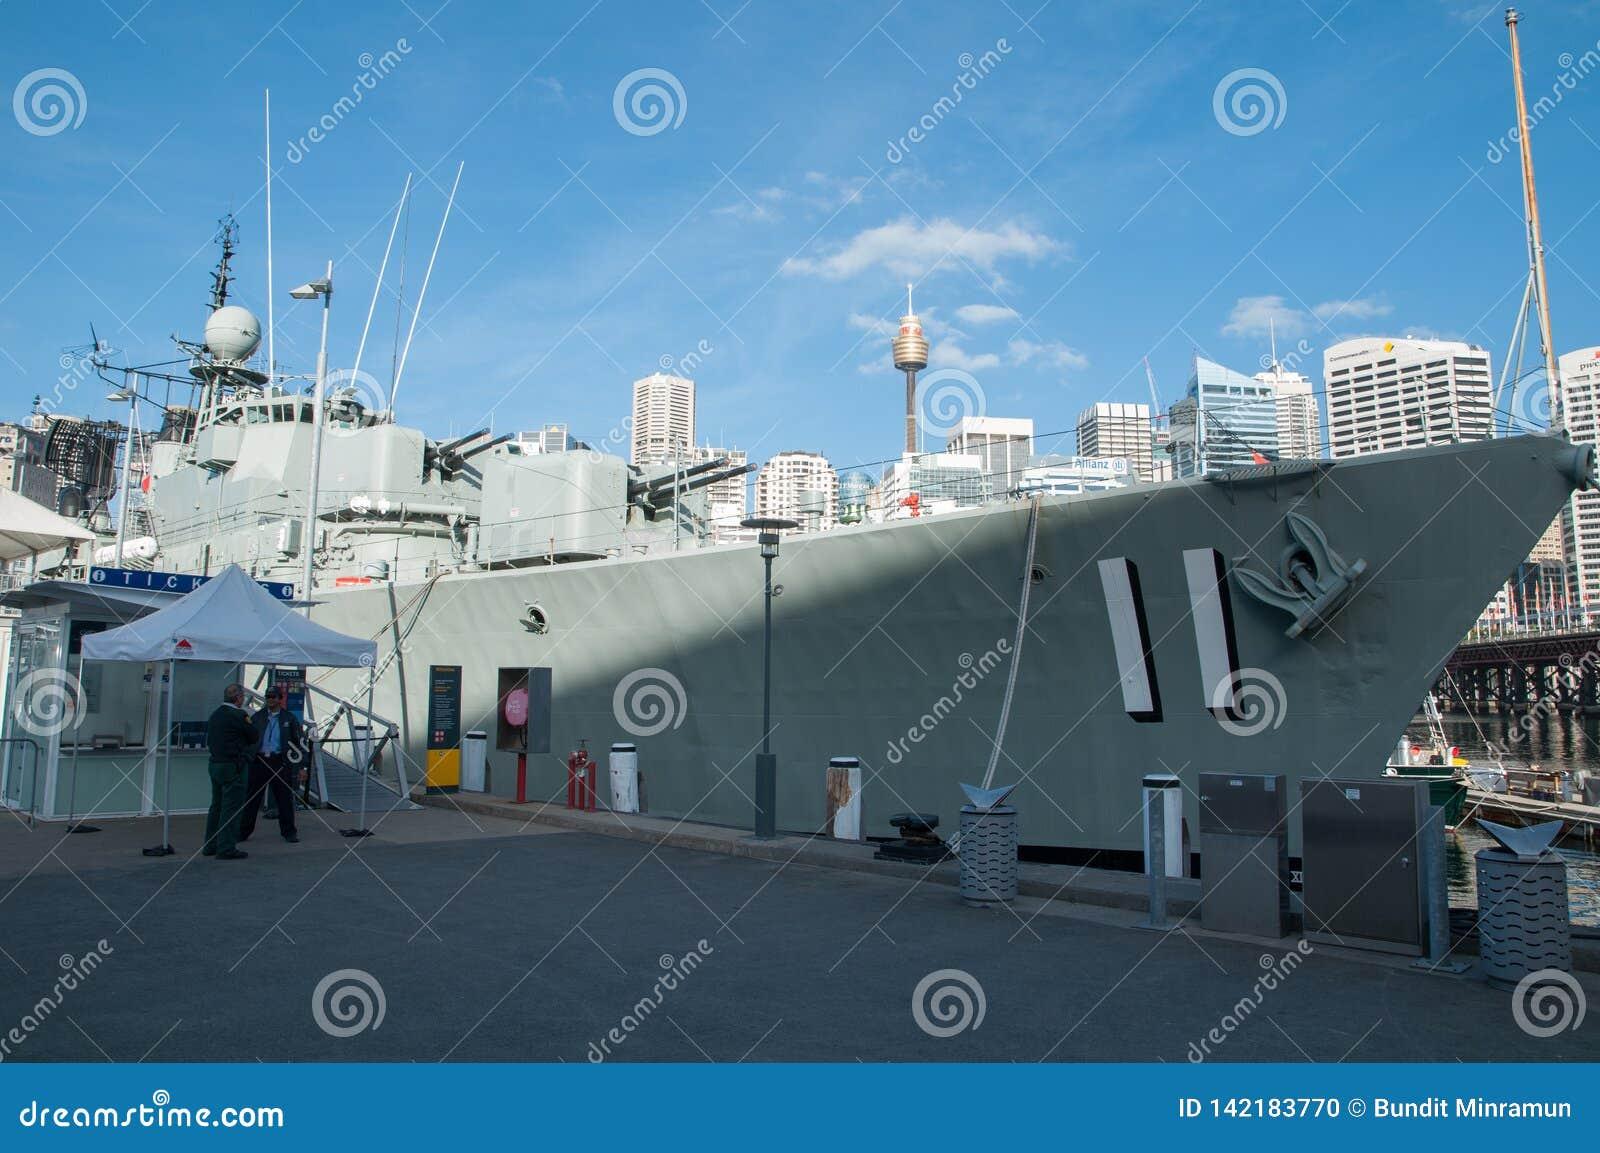 Battleship number 11 is mooring at Australian National Maritime Museum, Darling harbour.